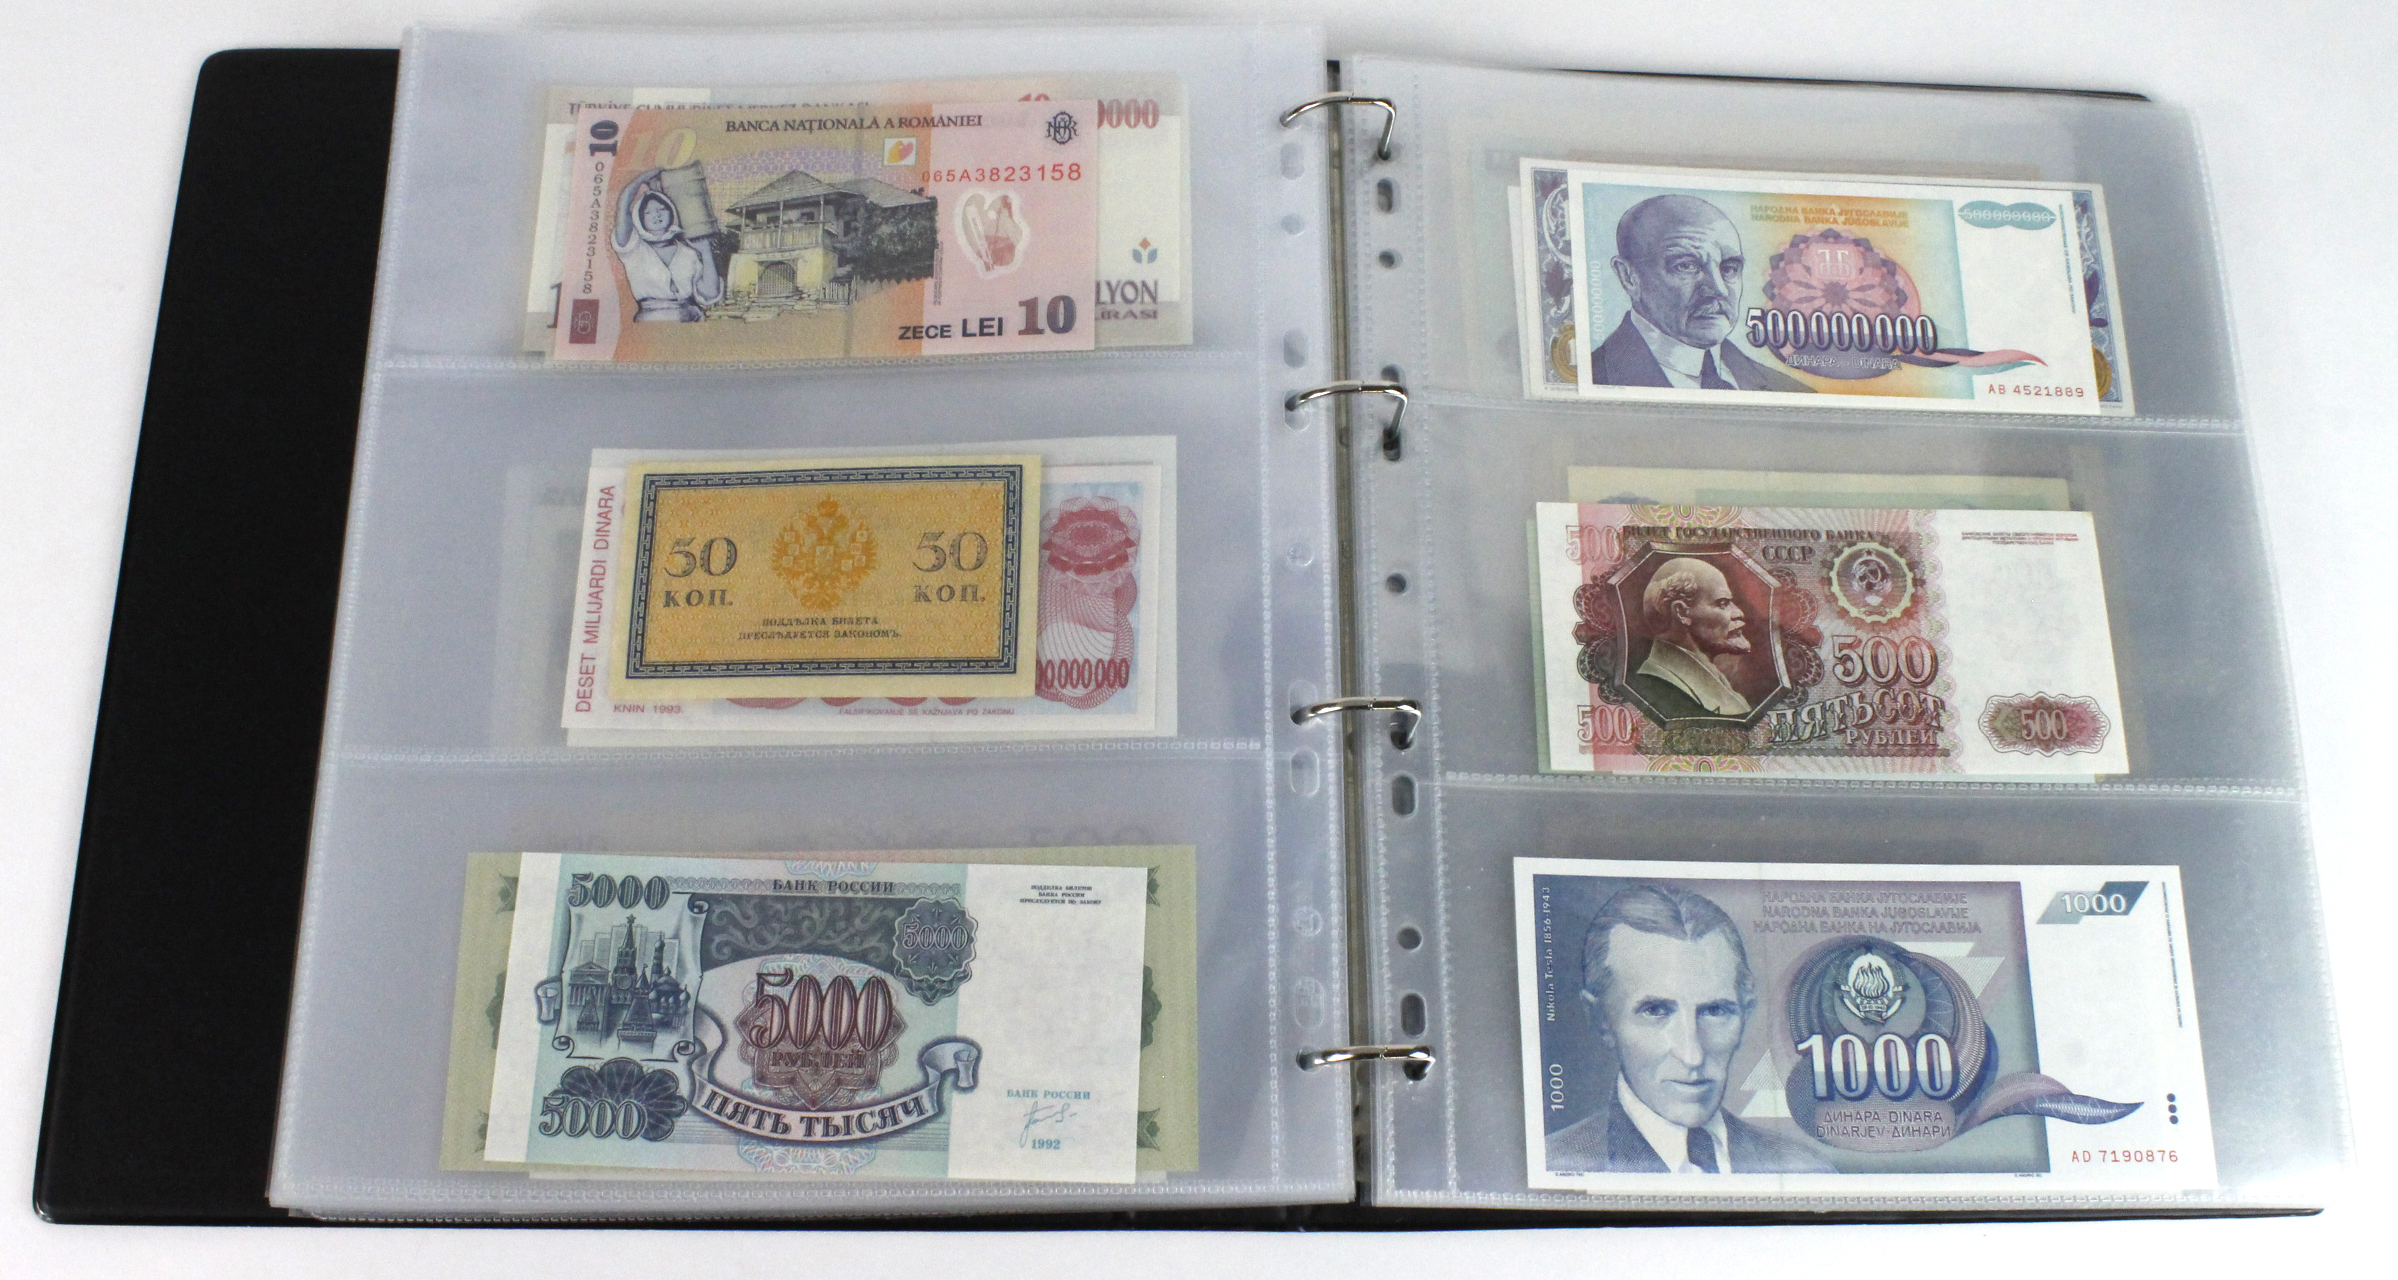 World (163), in banknote album including Bahamas, Spain, Sweden, Netherlands, Algeria, Macau, - Image 43 of 57